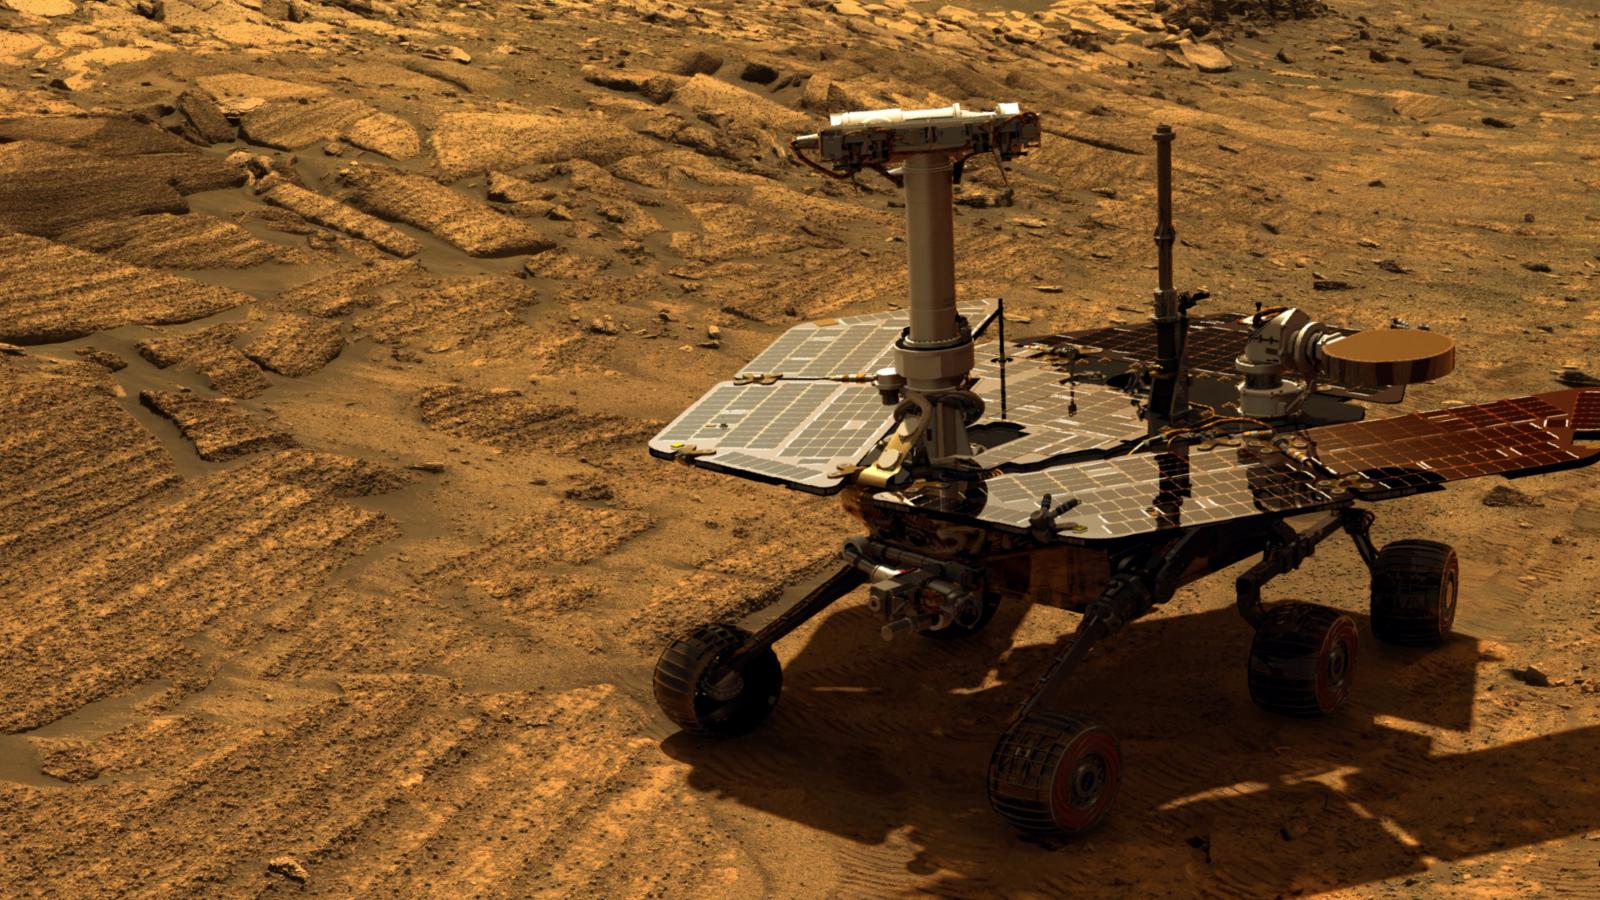 mars rover failure units - photo #6